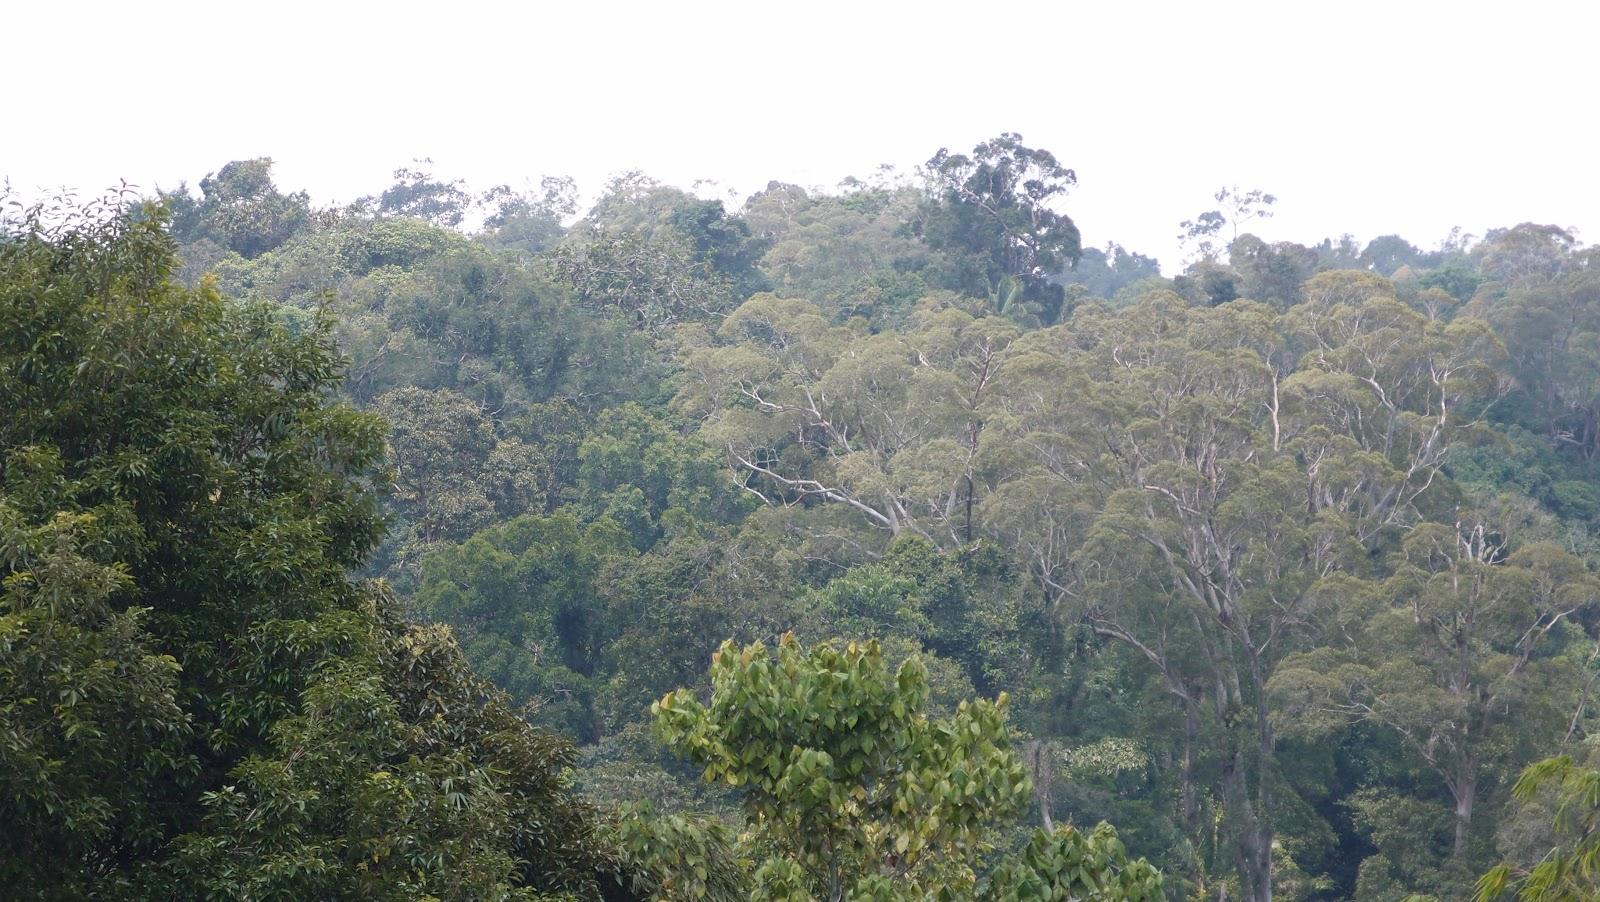 Bukit Barisan National Park Hasim S Space